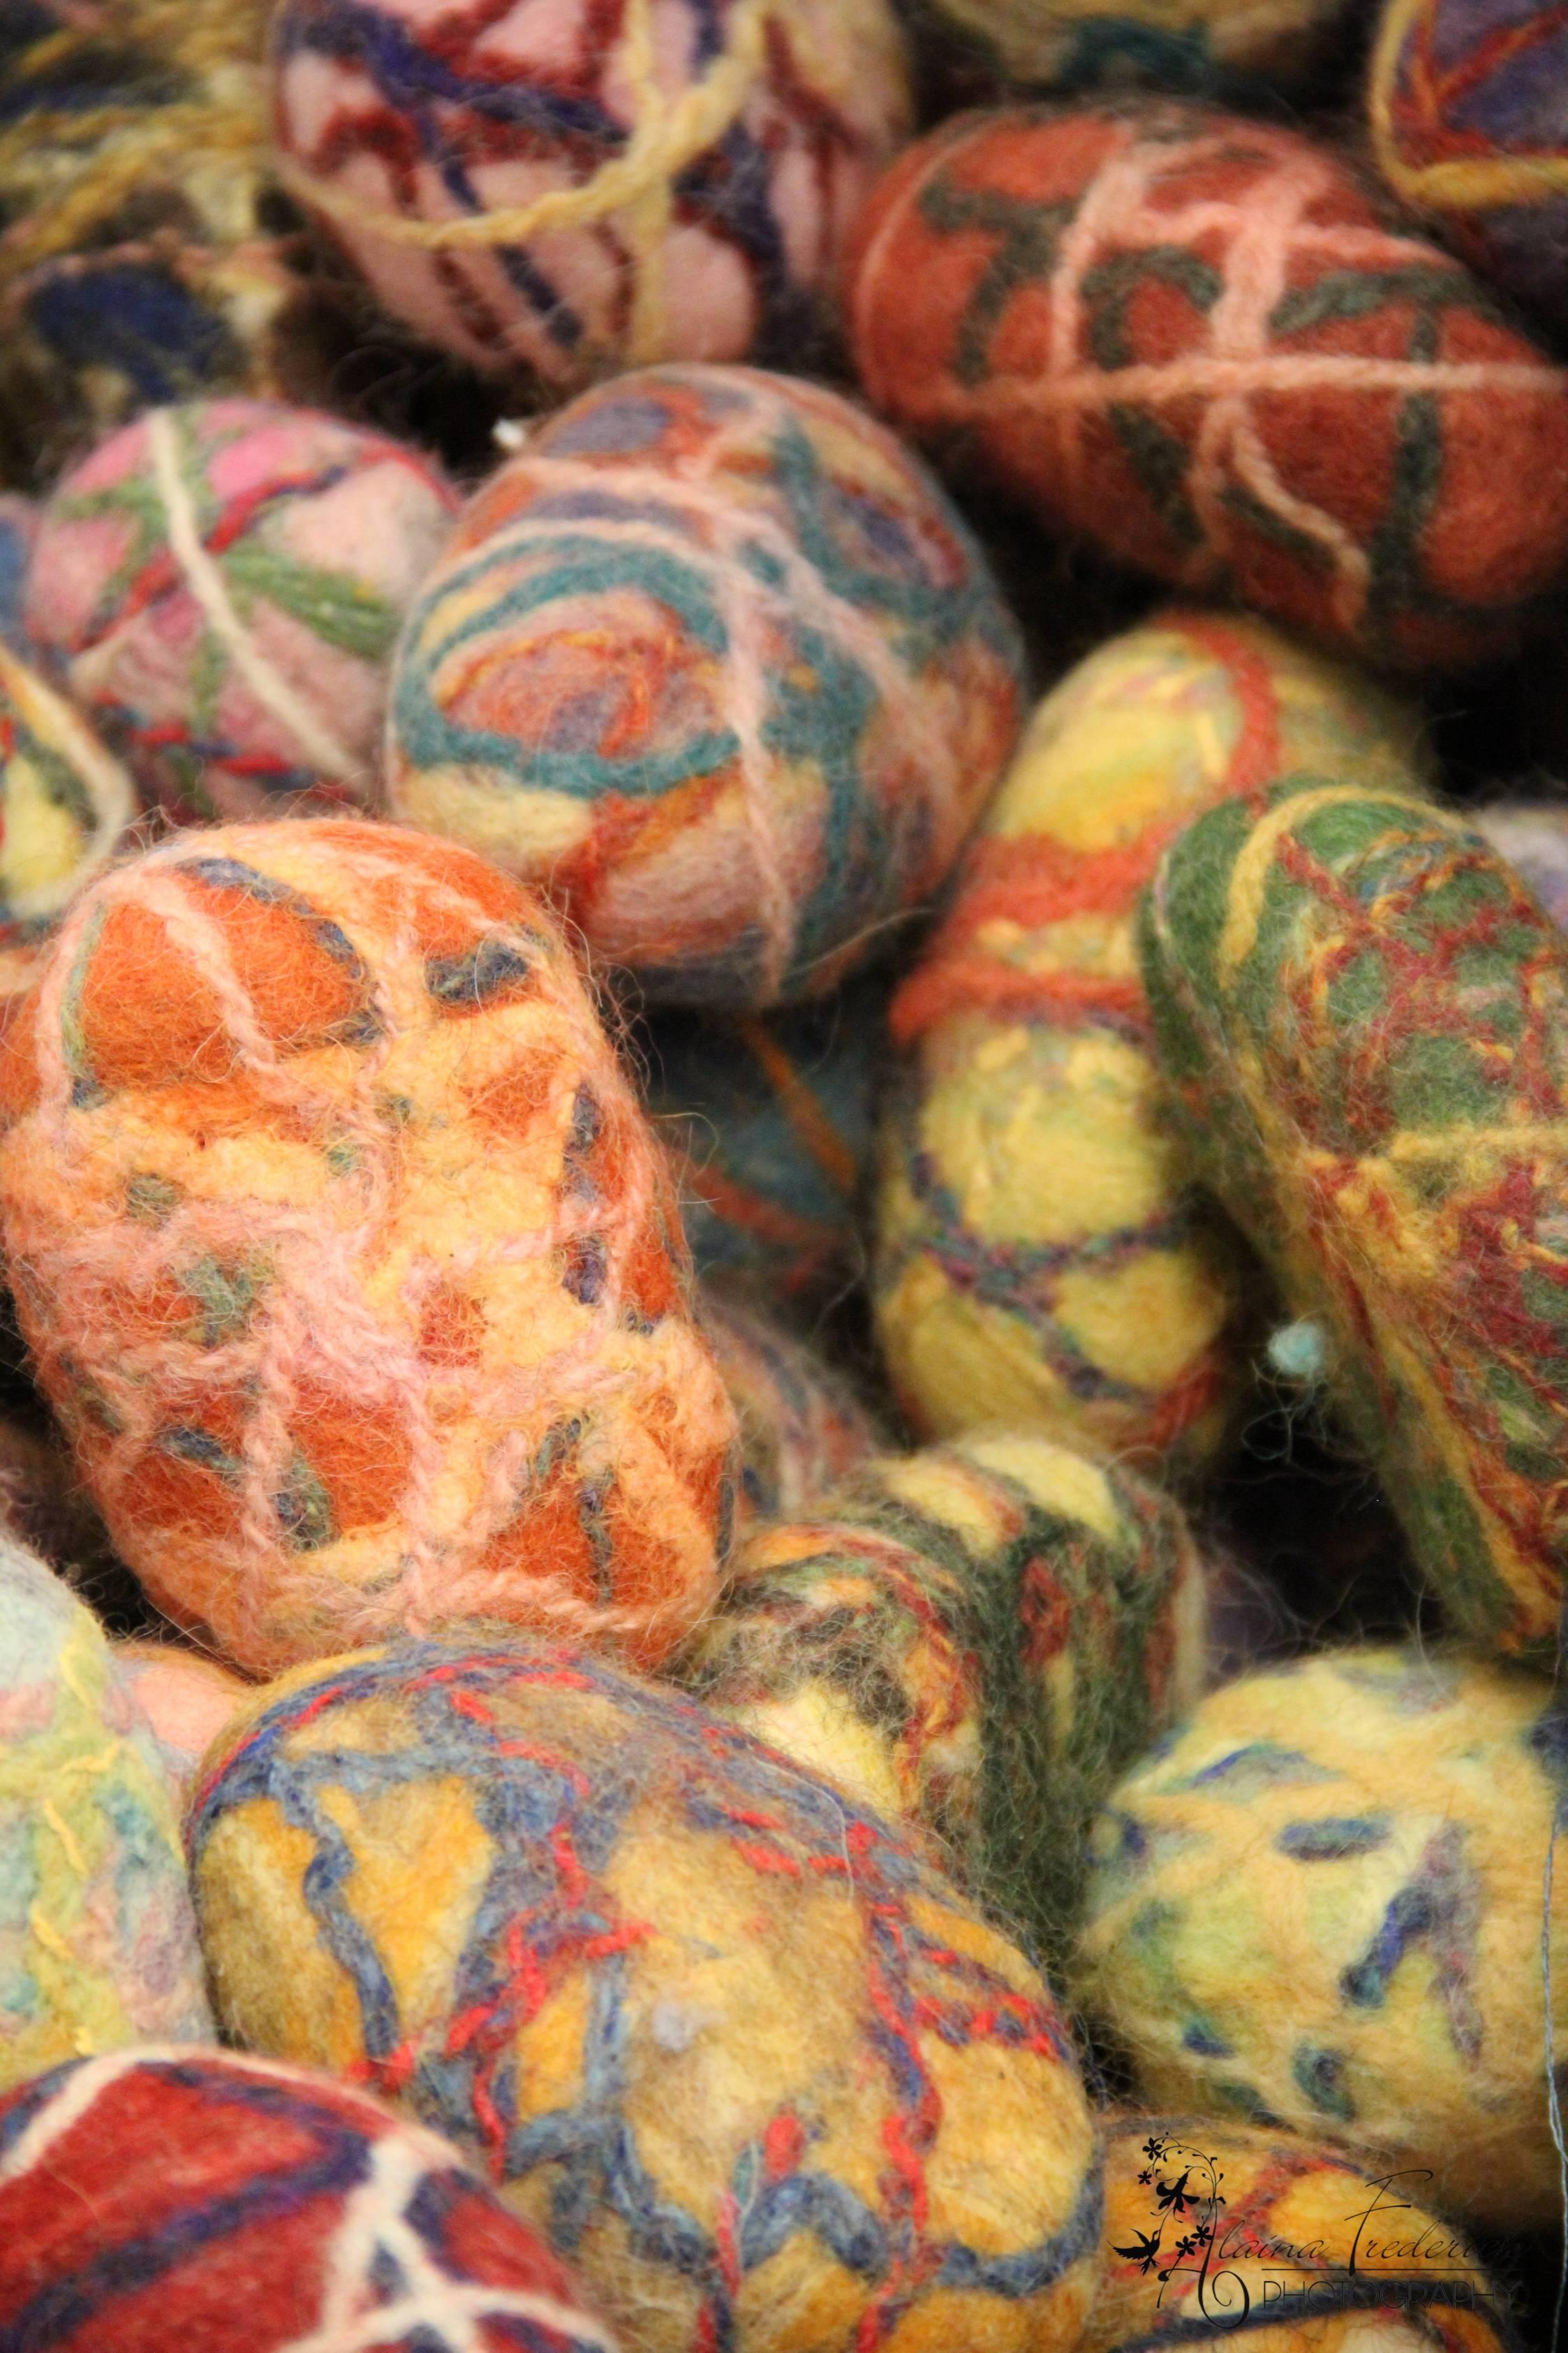 Felted Lavender Soaps: Pittsburgh Knit & Crochet Festival @DinkerGiggles #knit #crochet